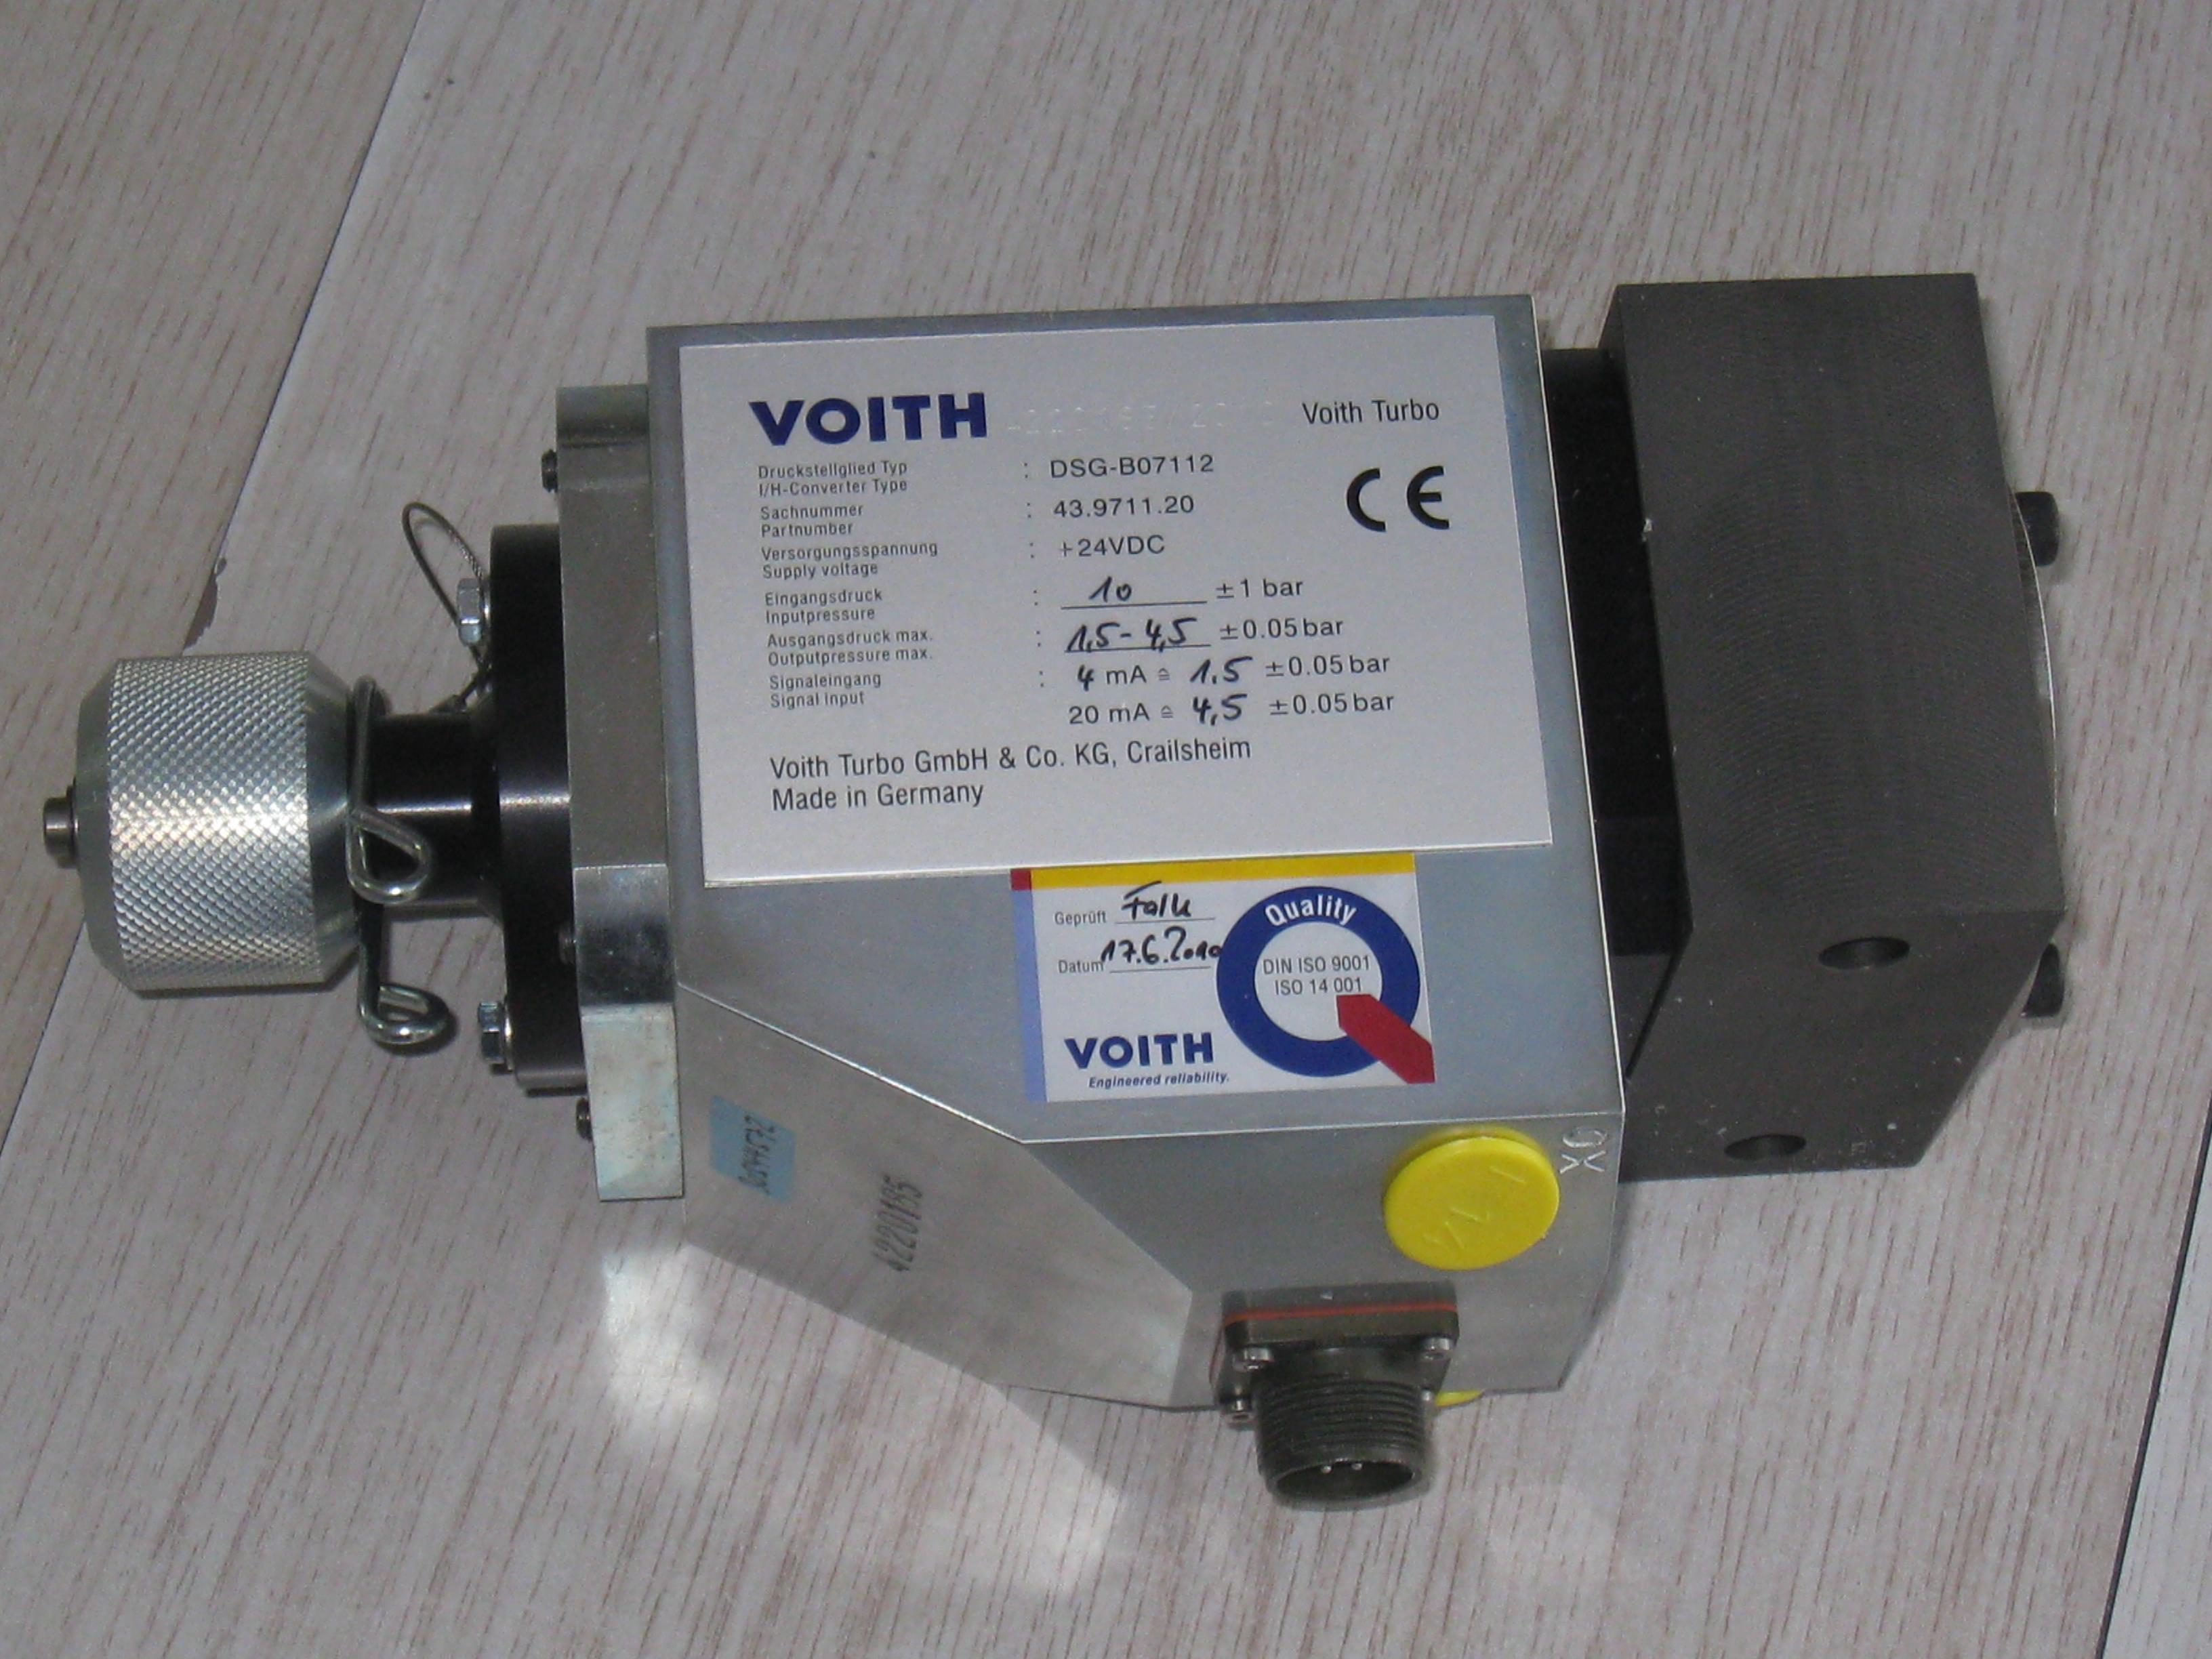 Voith DSG-B07112 、DSG-B07212电液转换器